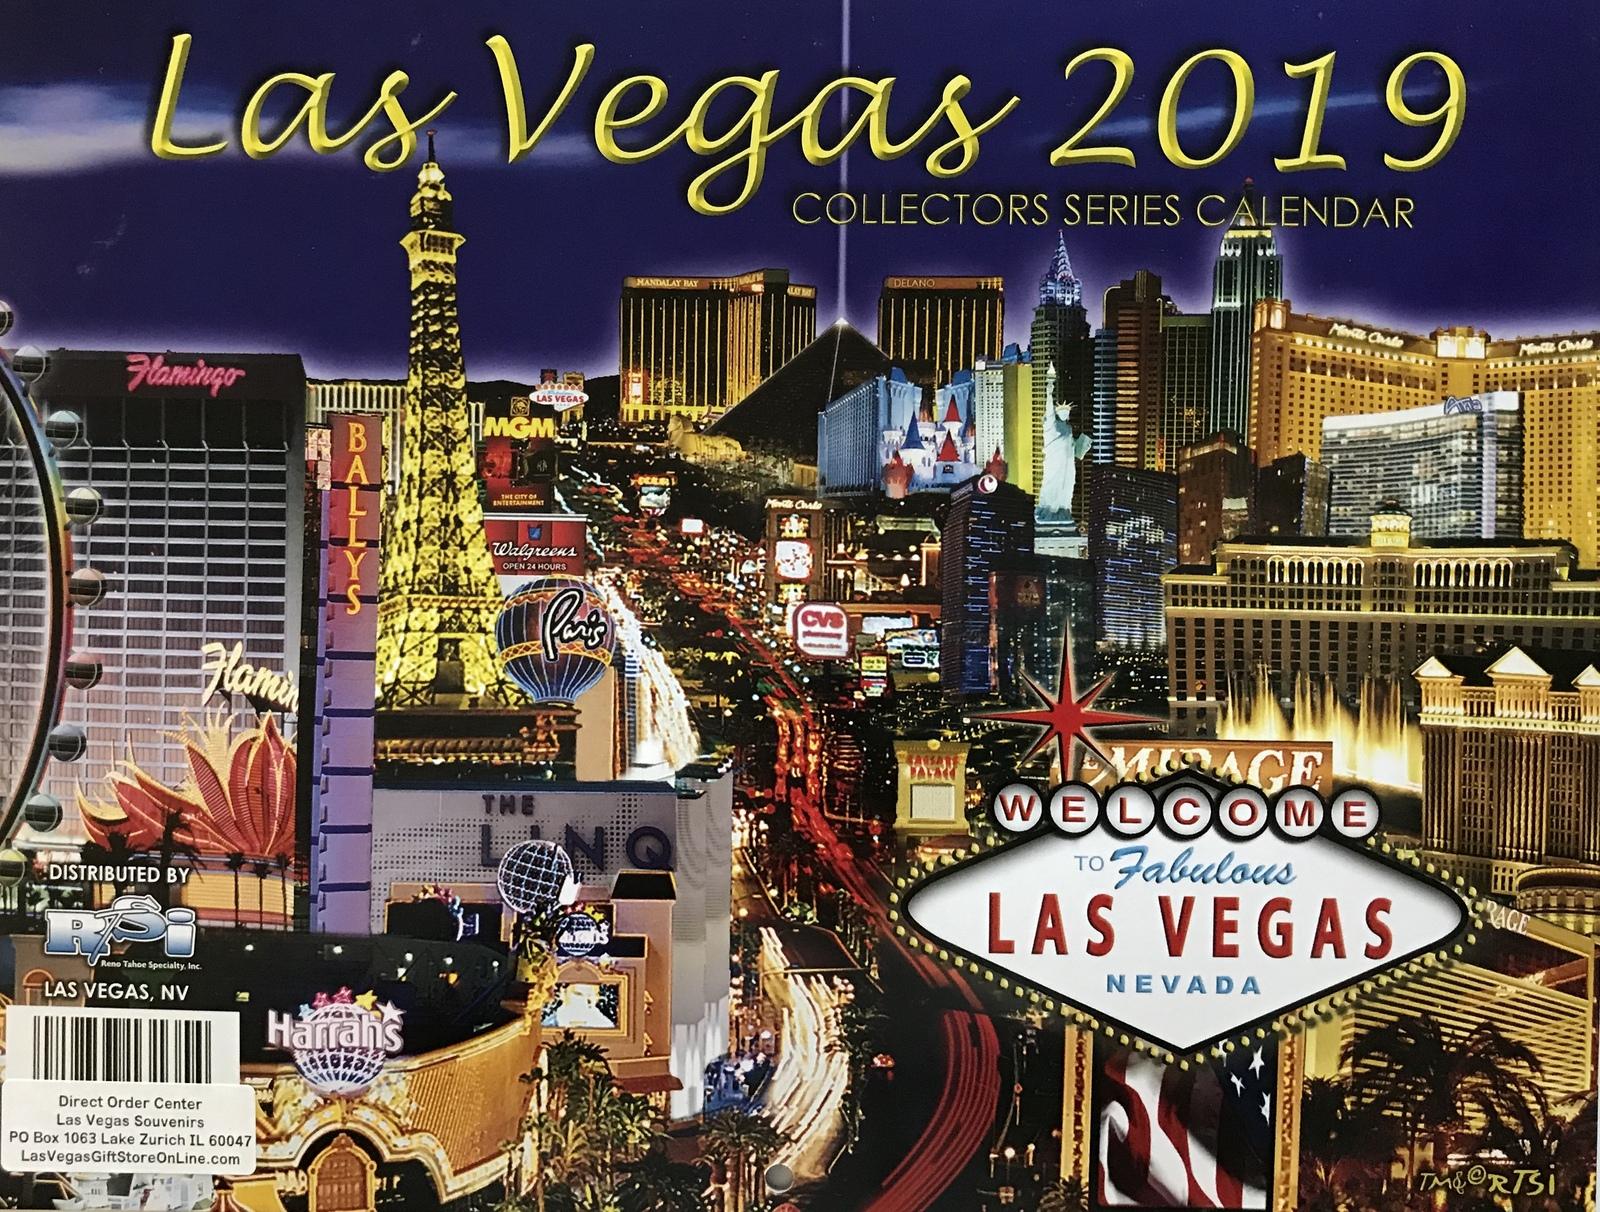 Las Vegas Calendar 2019 2019 13 Month Las Vegas Wall Calendar MGM and 11 similar items